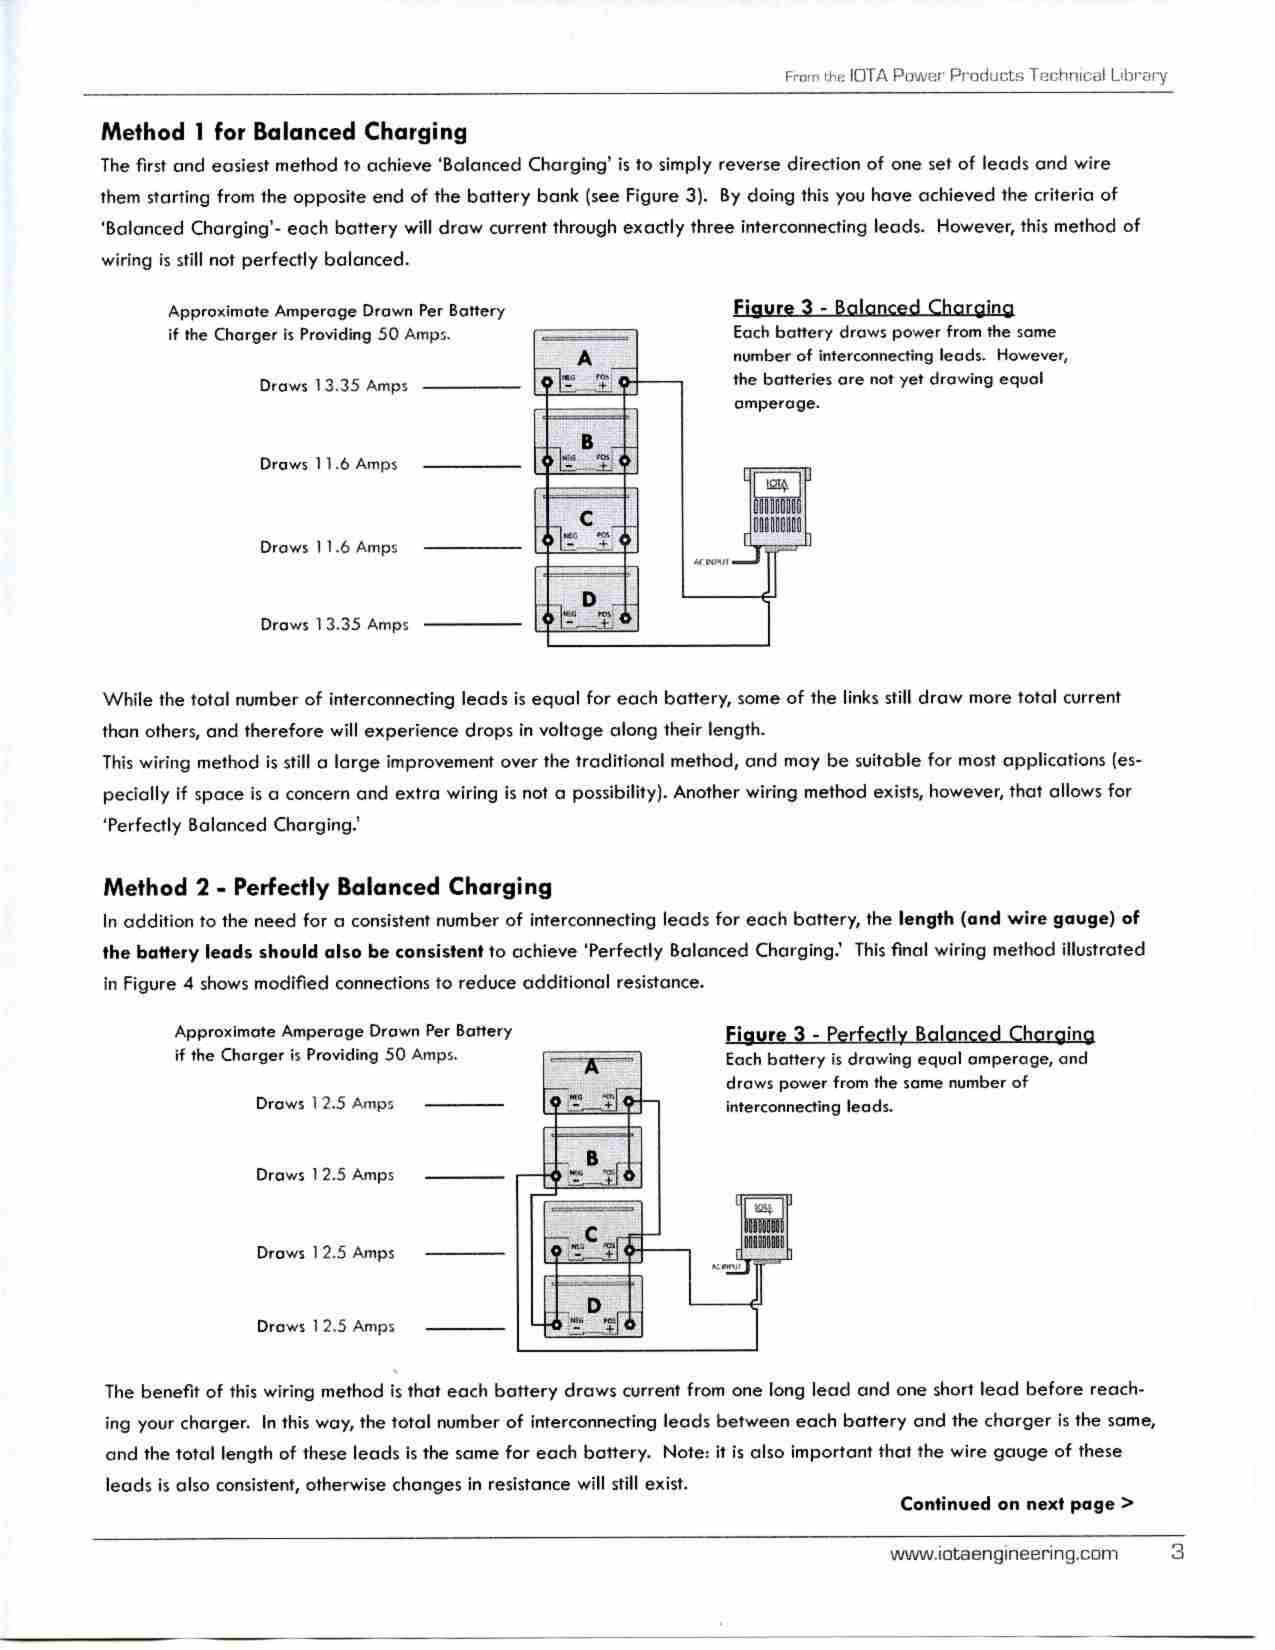 Cool Bodine B4cf1 Wiring Diagram Ideas - Simple Wiring Diagram ...